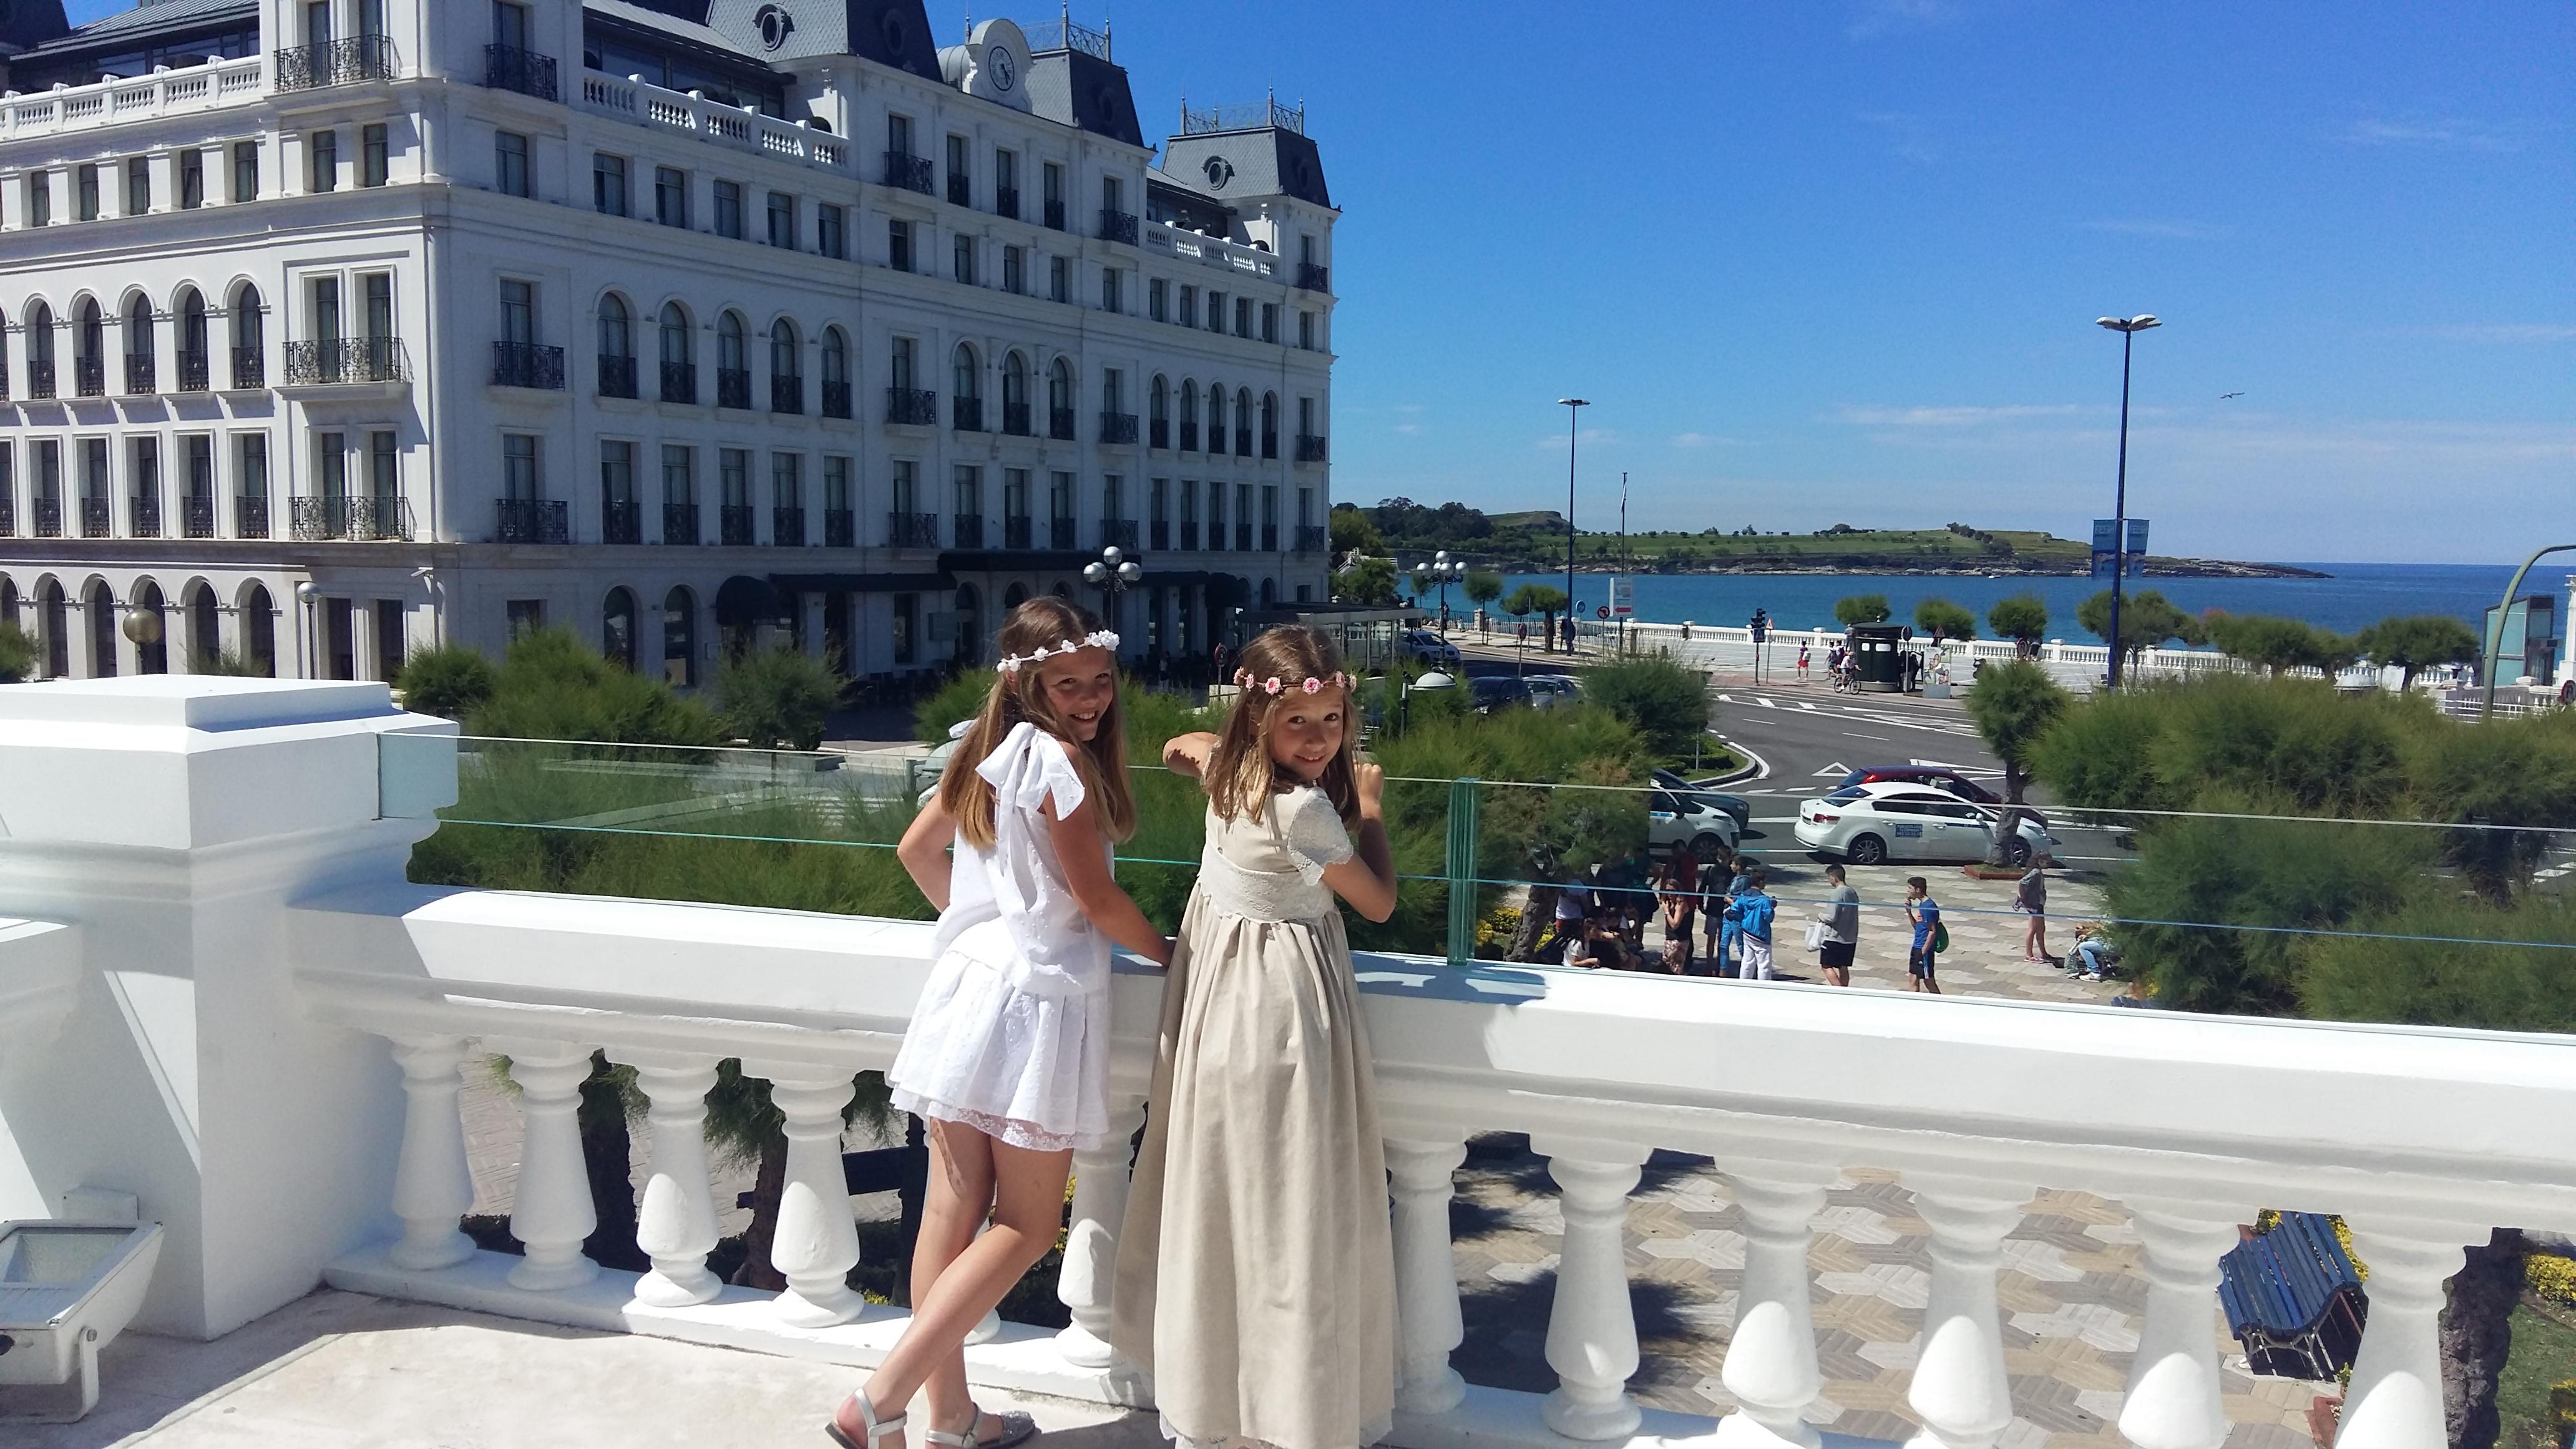 niñas con estilo, moda infantil estilosa,vestido de comunion, comunion 2017, arras online, alta costura niños, ropa de ceremonia infantil a medida, ceremonia infantil (3)